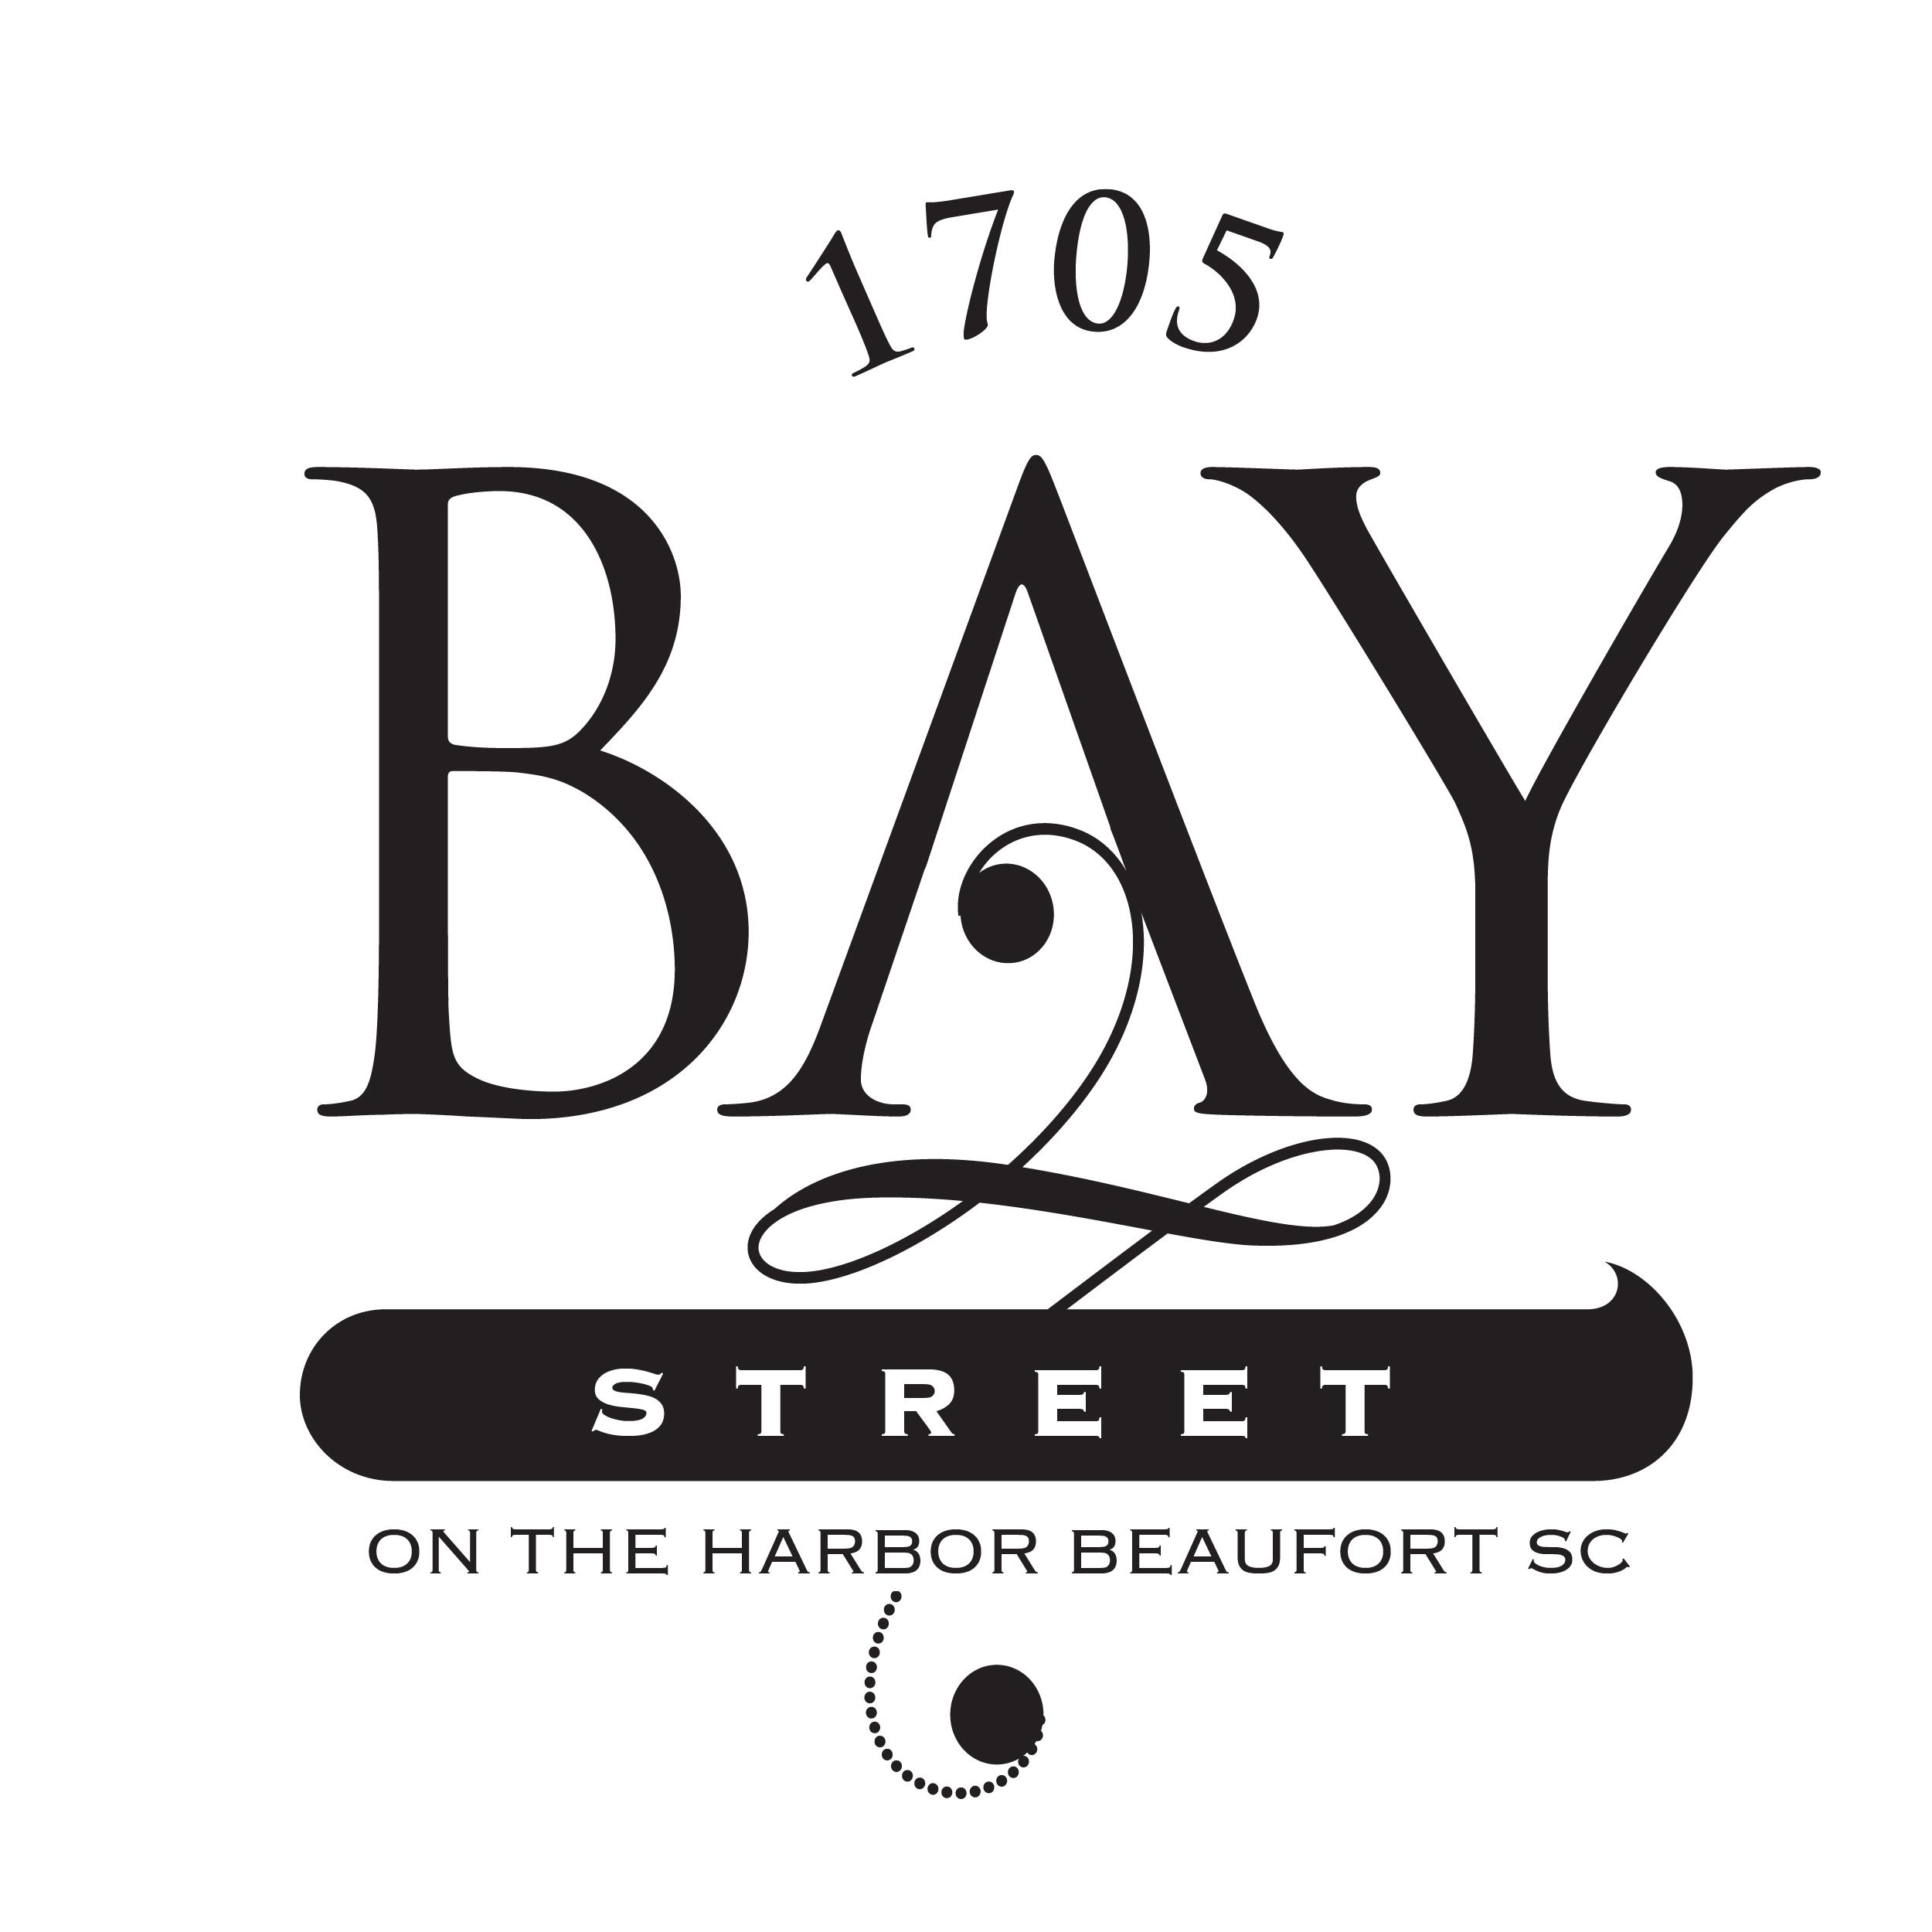 1705 Bay Street Logo